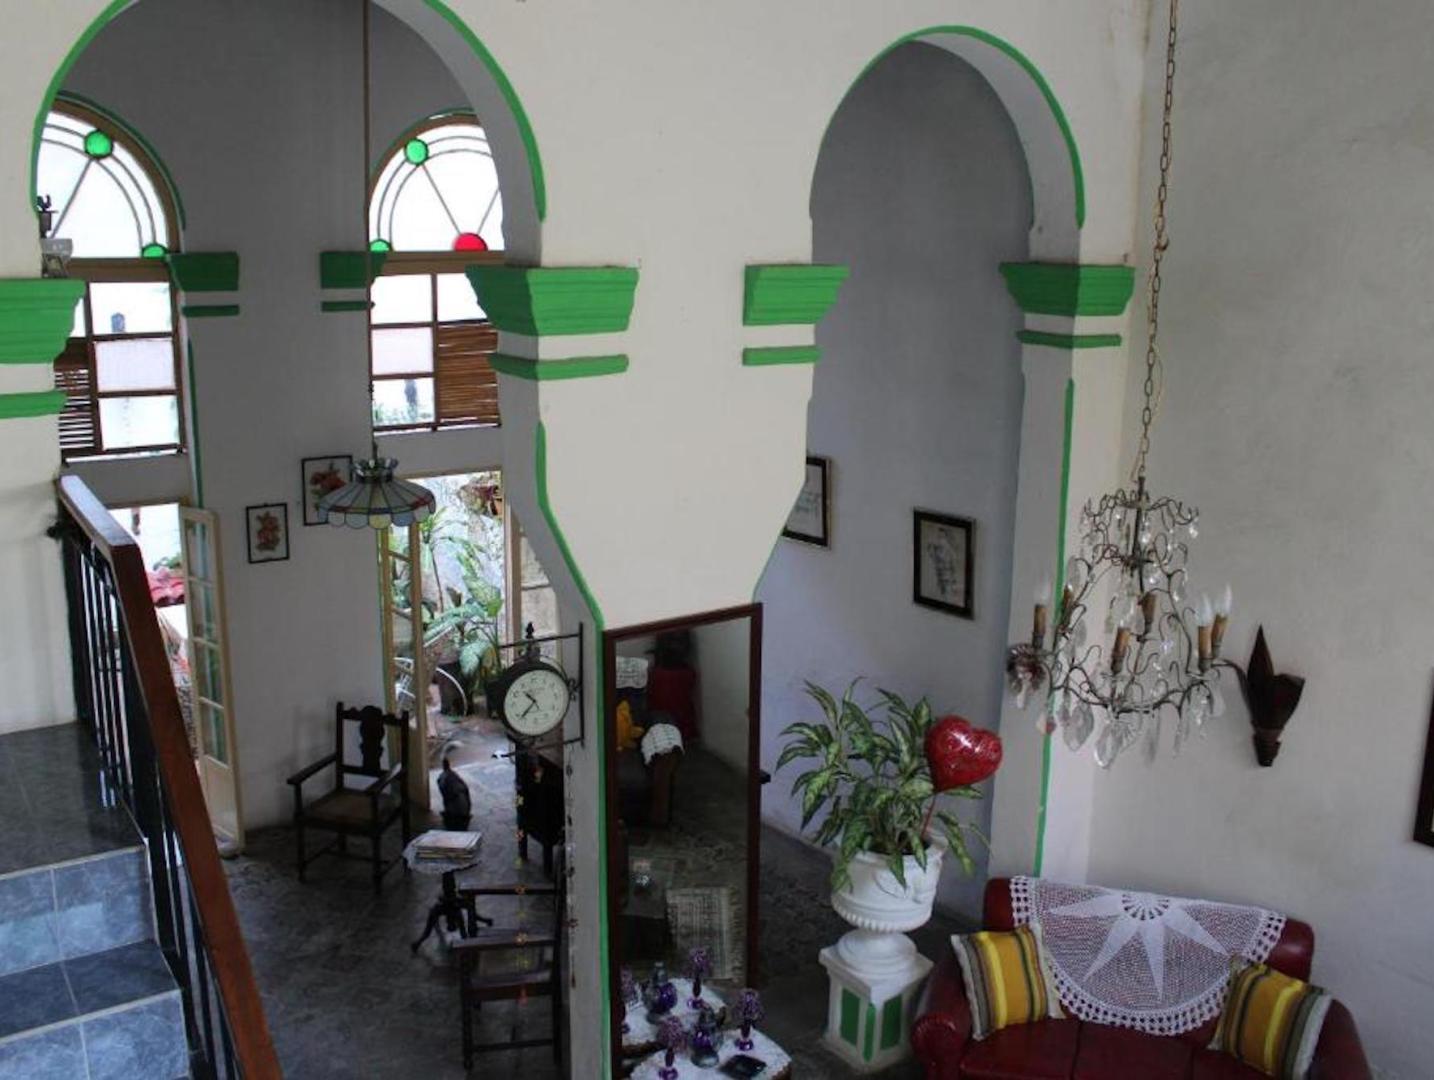 Casa de alquiler en cuba casa andaluz